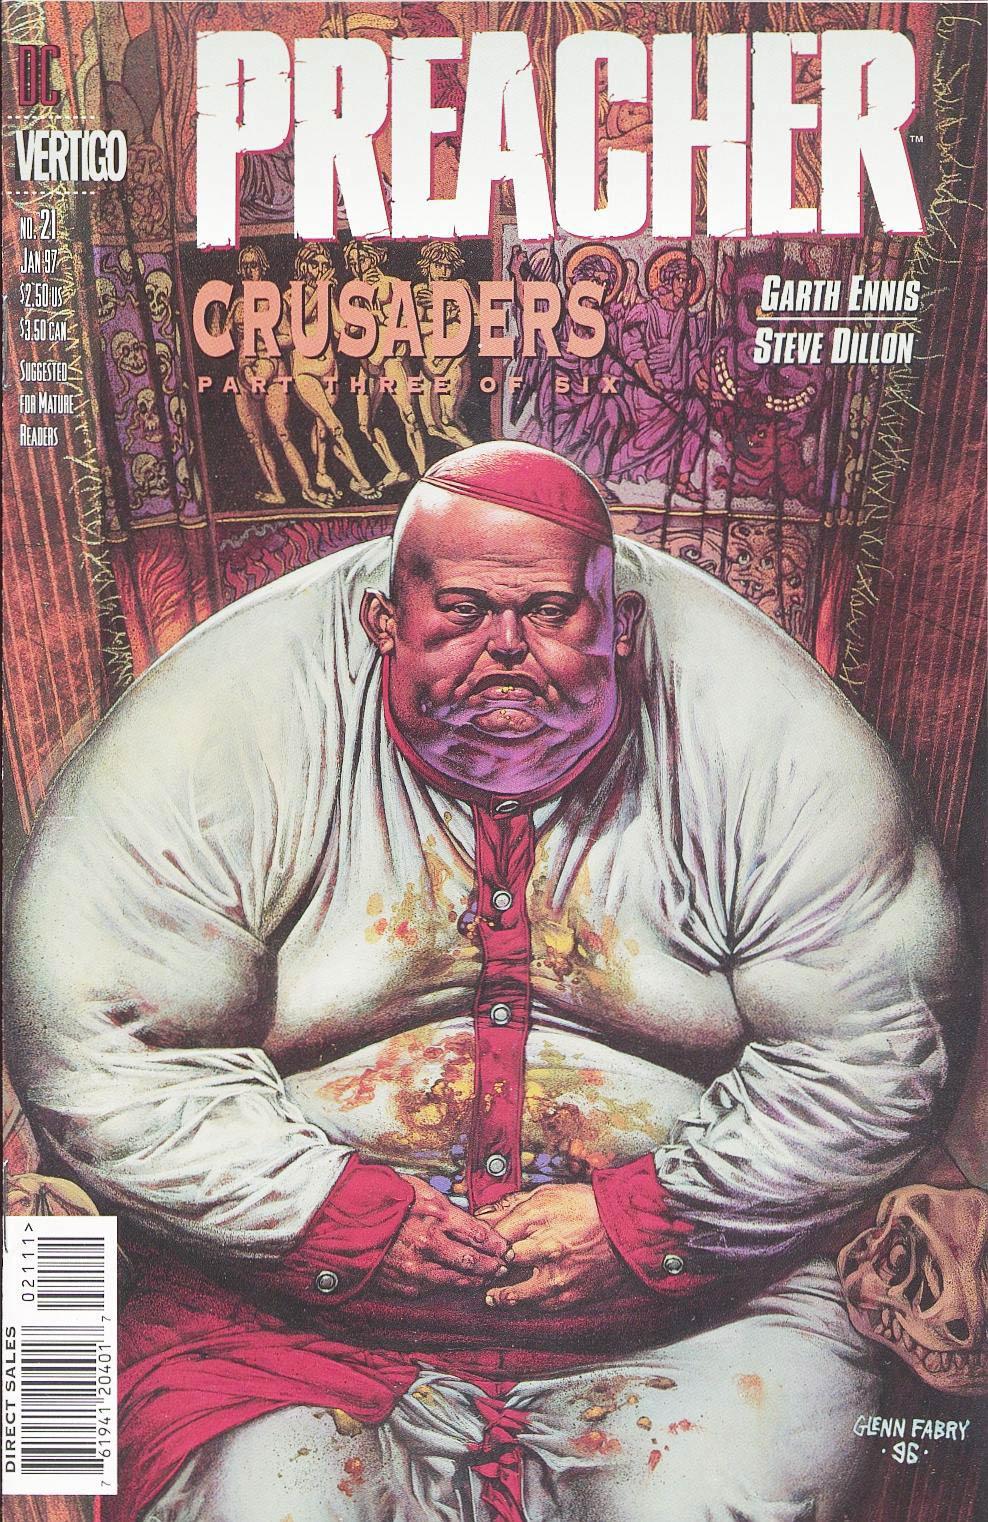 Комиксы Онлайн - Проповедник - # 21 - Страница №1 - Preacher - Preacher # 21